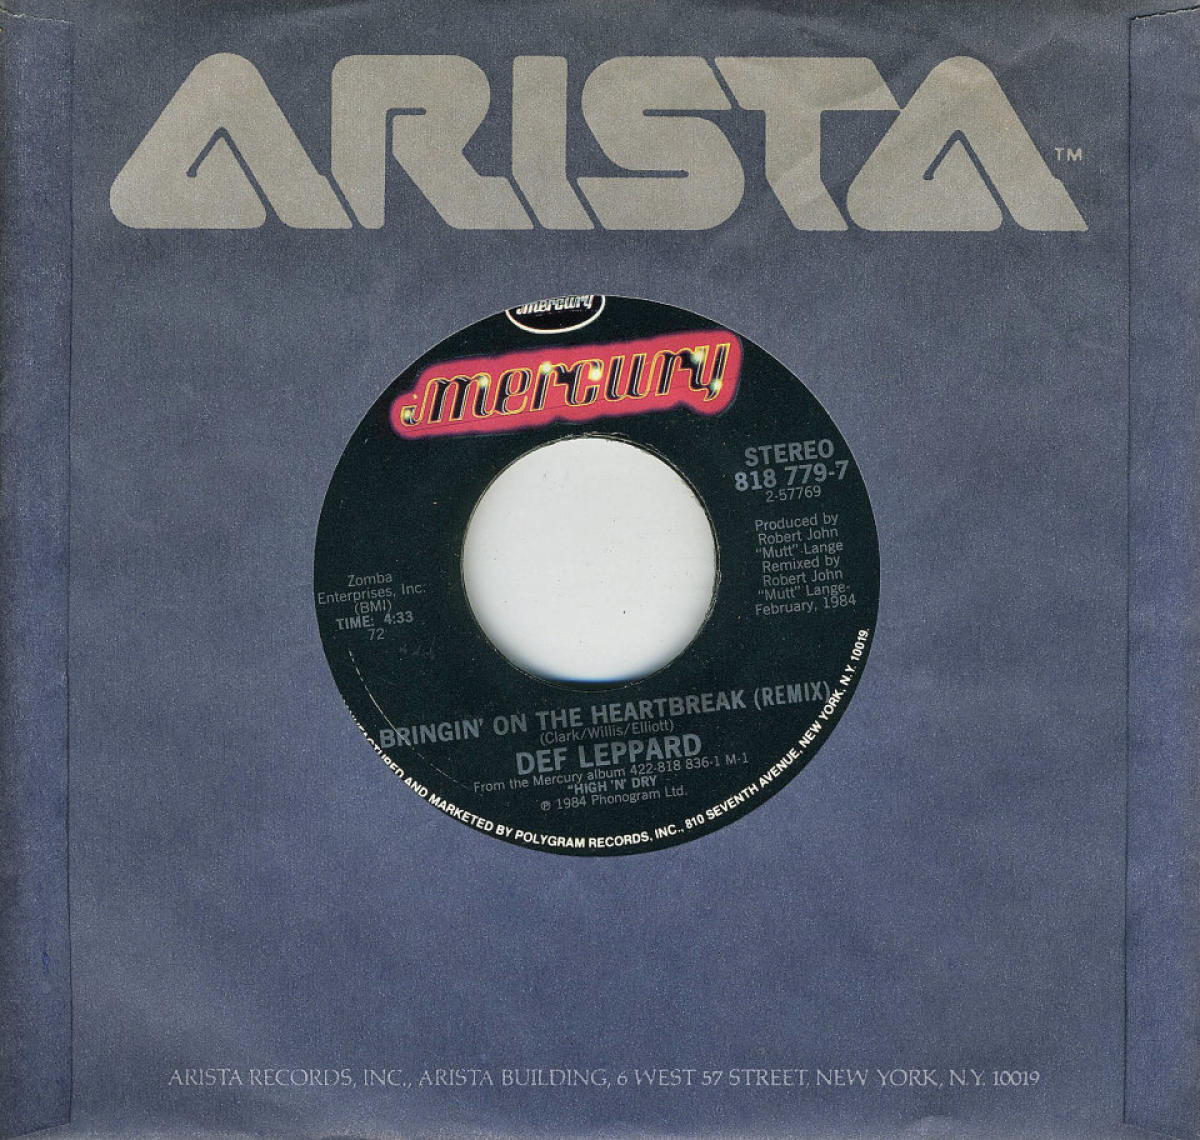 Def Leppard Vinyl 7